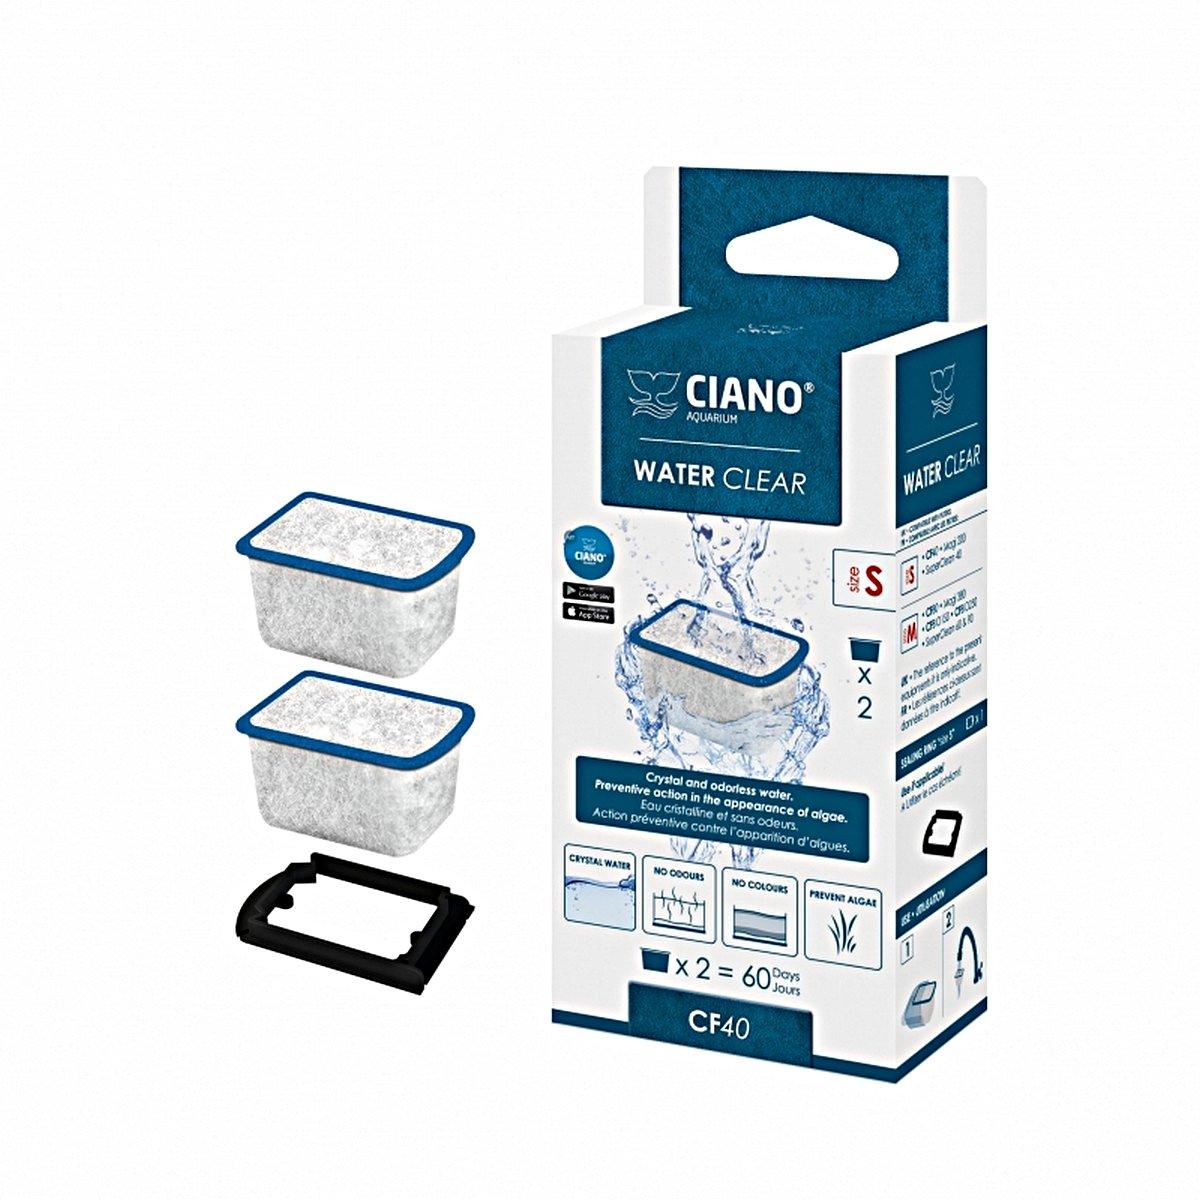 Afbeelding van Ciano Water Clear 2st Blauw 3,8x3x2,3cm